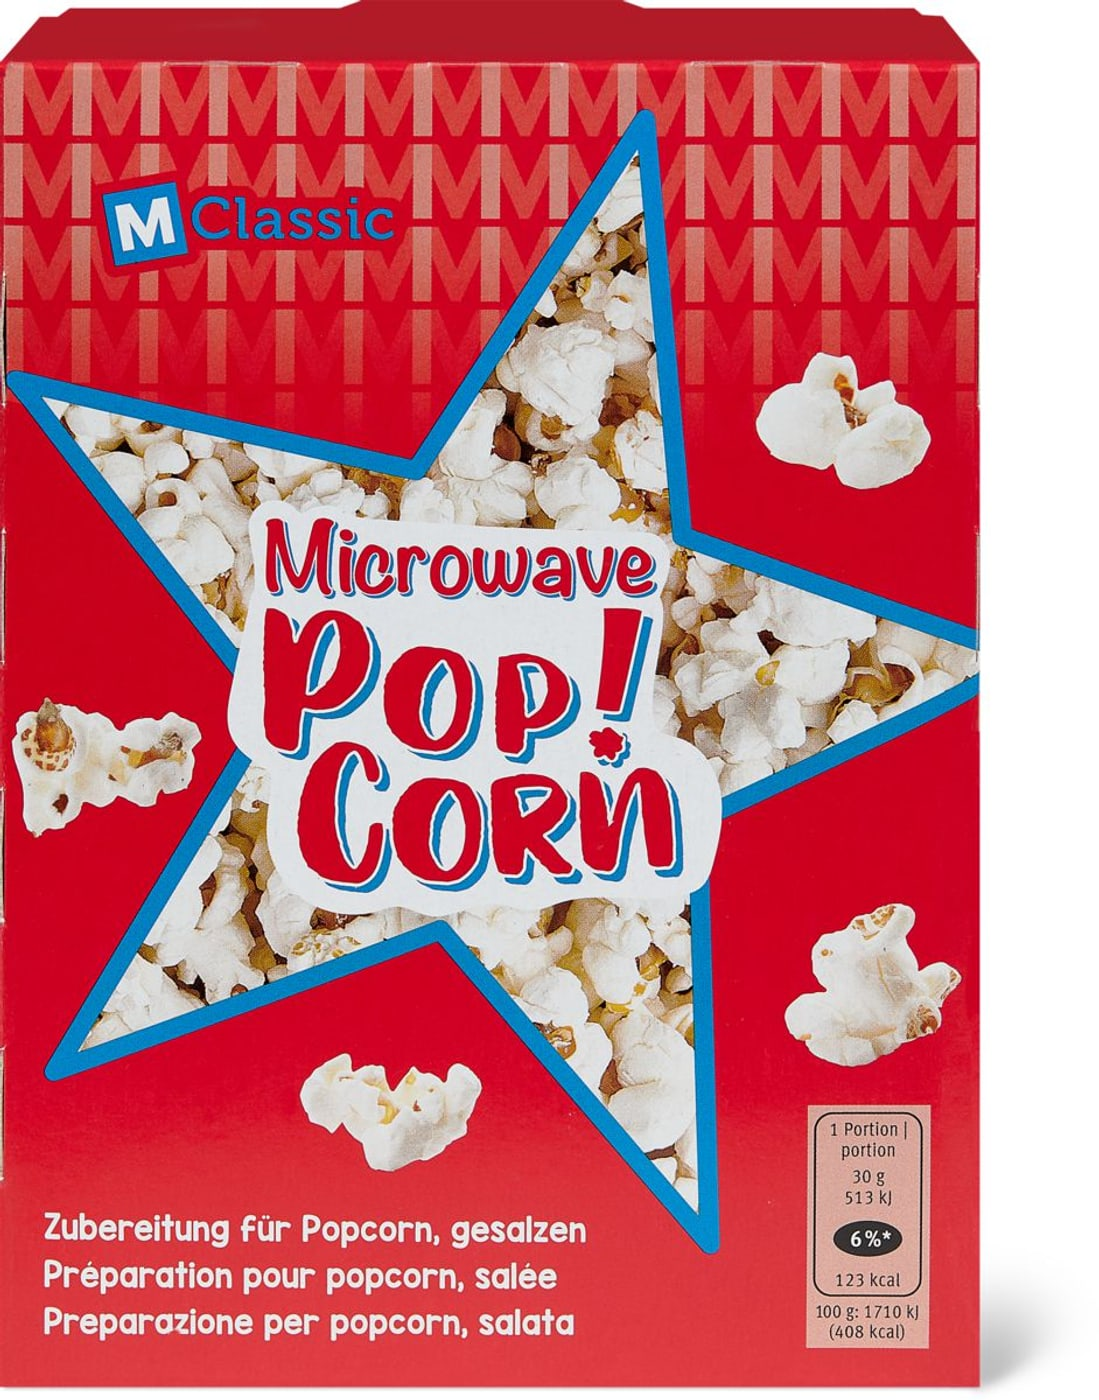 M Classic Microwave Popcorn Gesalzen Migros